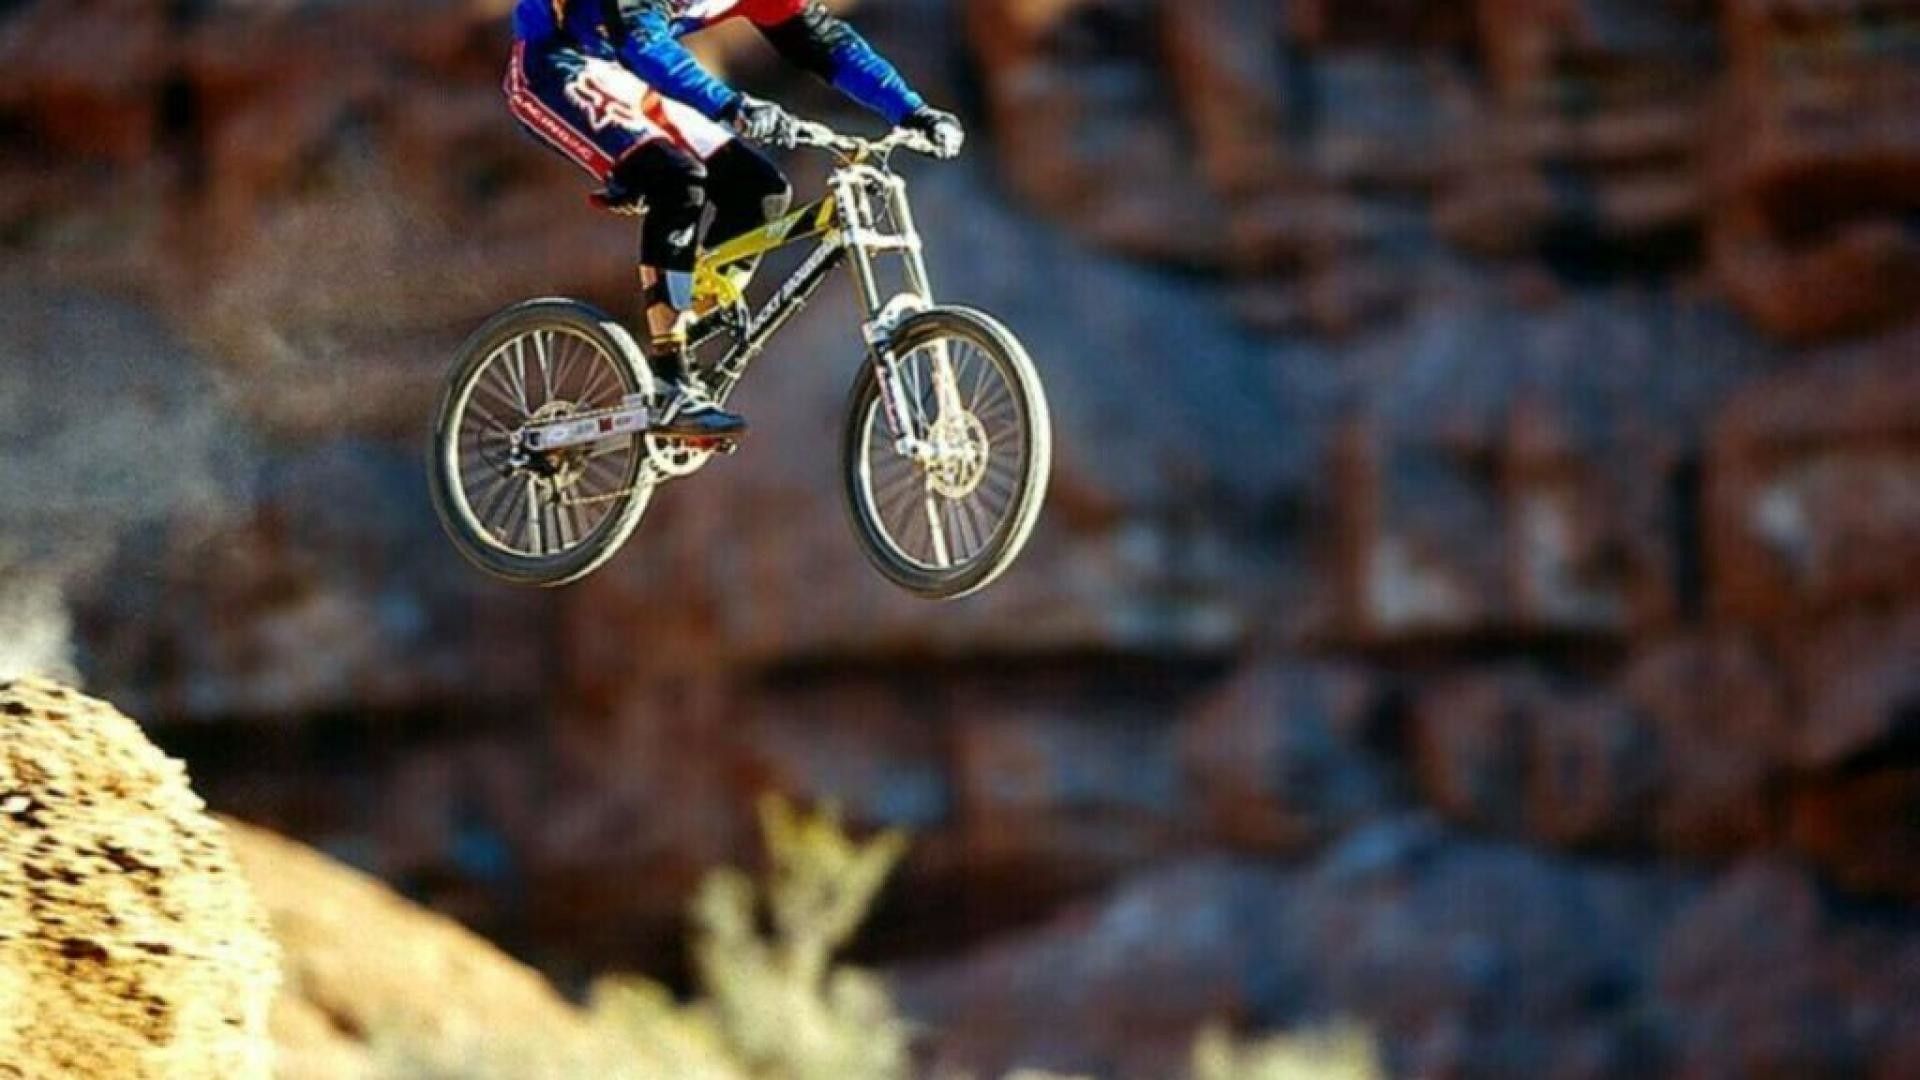 Res: 1920x1080, mountain biking bike hd wallpaper wallpapers55com Best Wallpapers